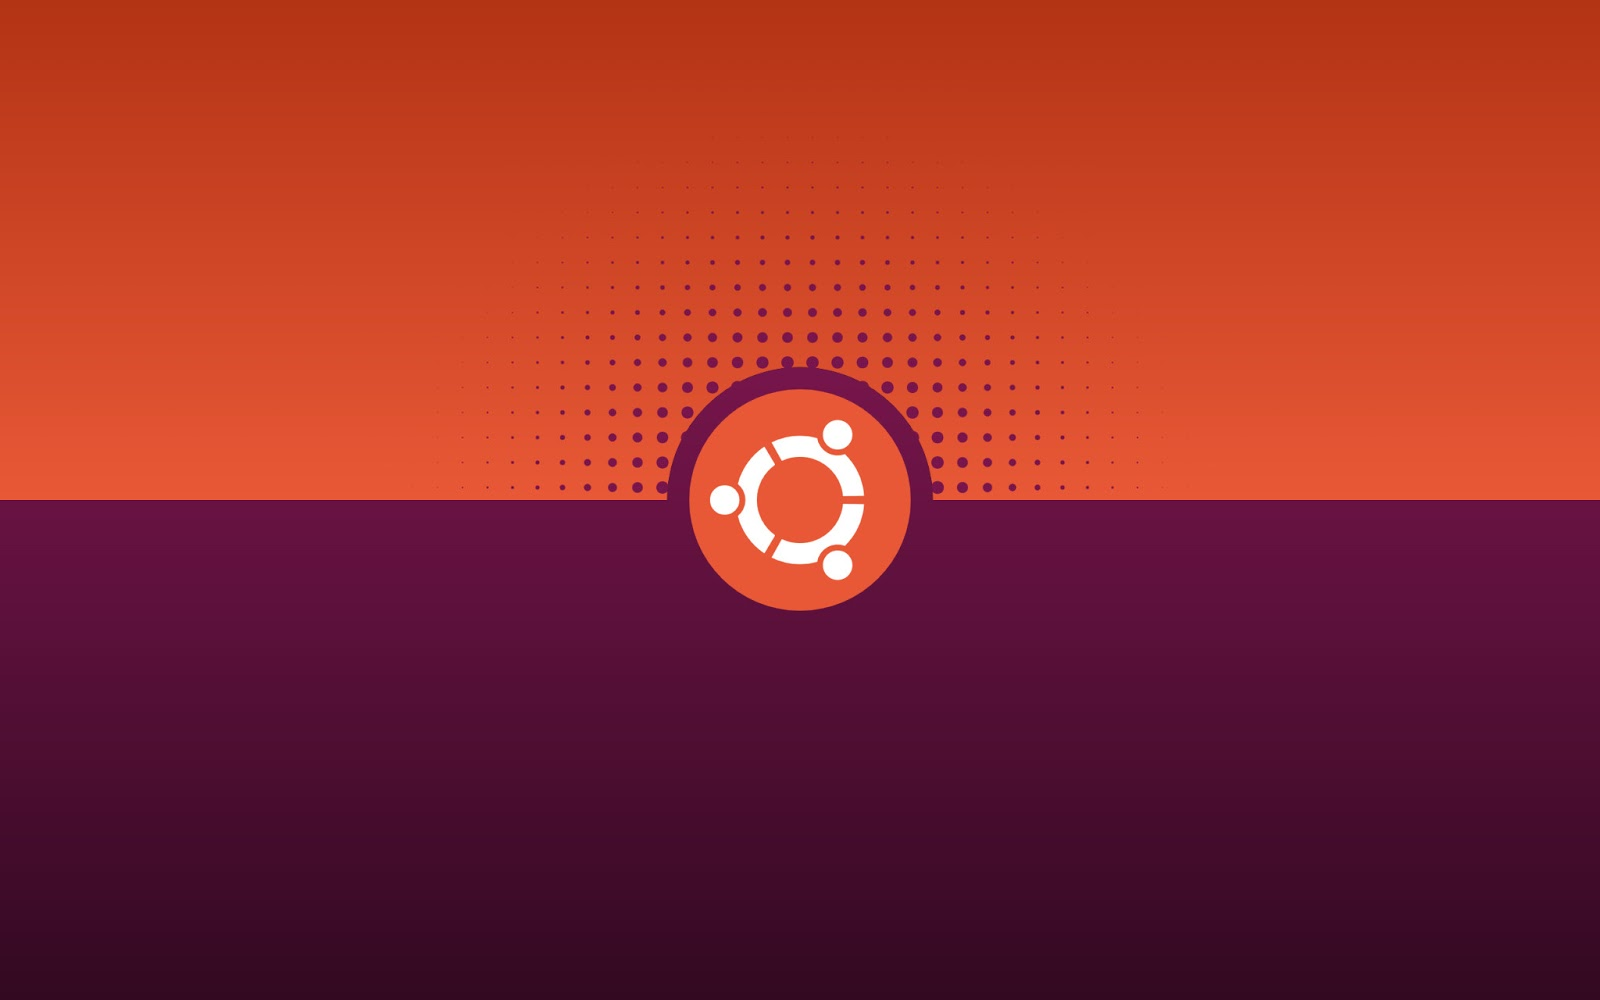 ubuntu wallpapers hd ubuntu wallpapers hd ubuntu wallpapers hd ubuntu 1600x1000